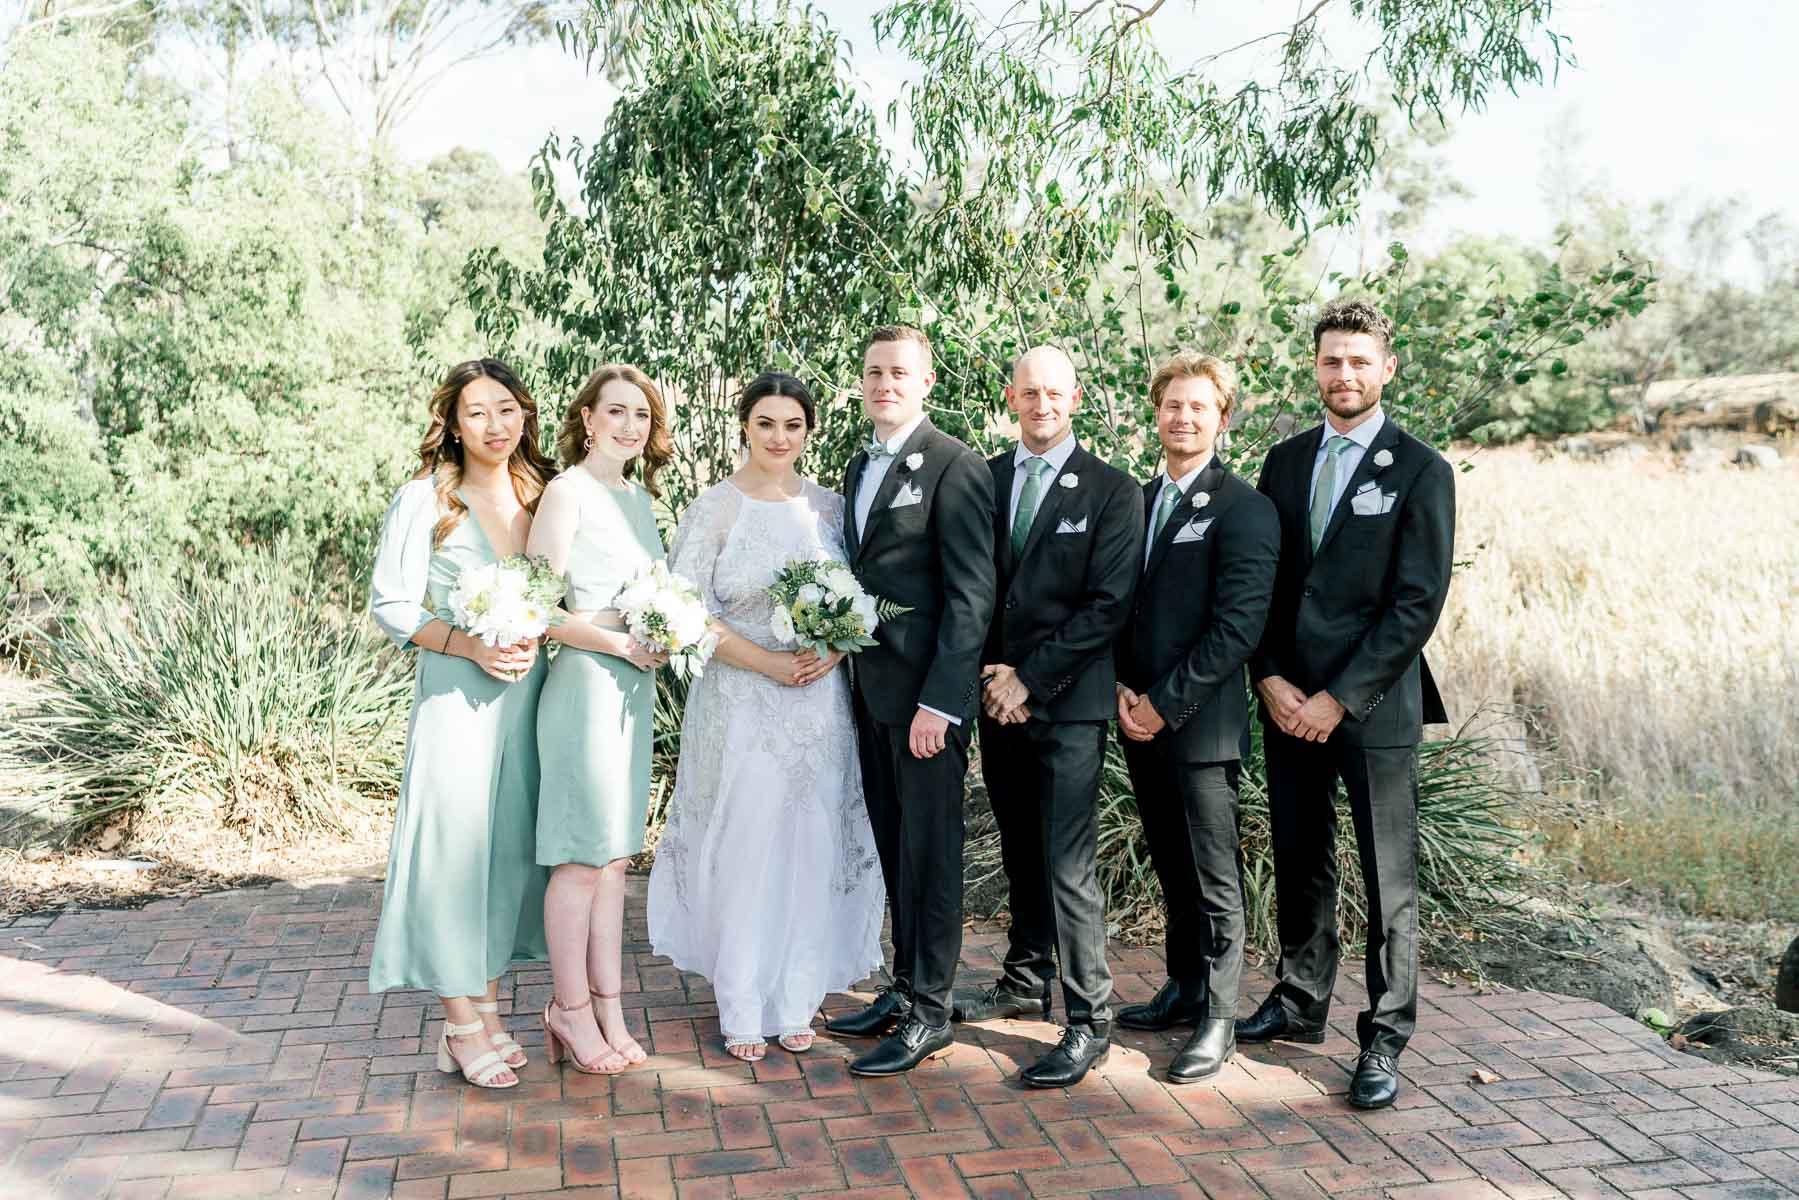 little-henri-cafe-wedding-thornbury-heart+soul-weddings-jane-aaron-05179.jpg